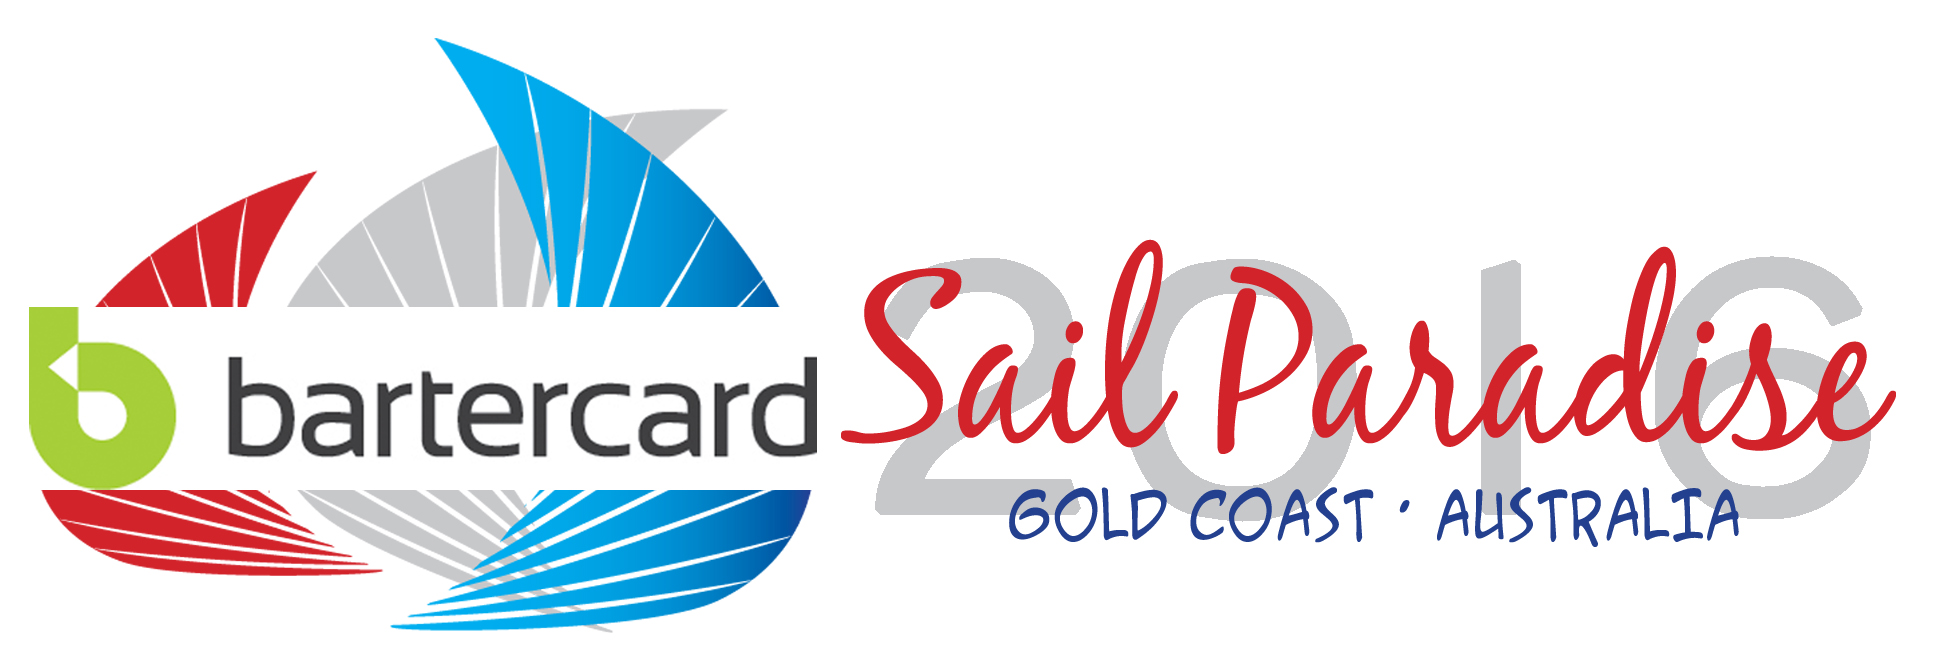 Bartercard_Sail_Paradise_Logo_2016